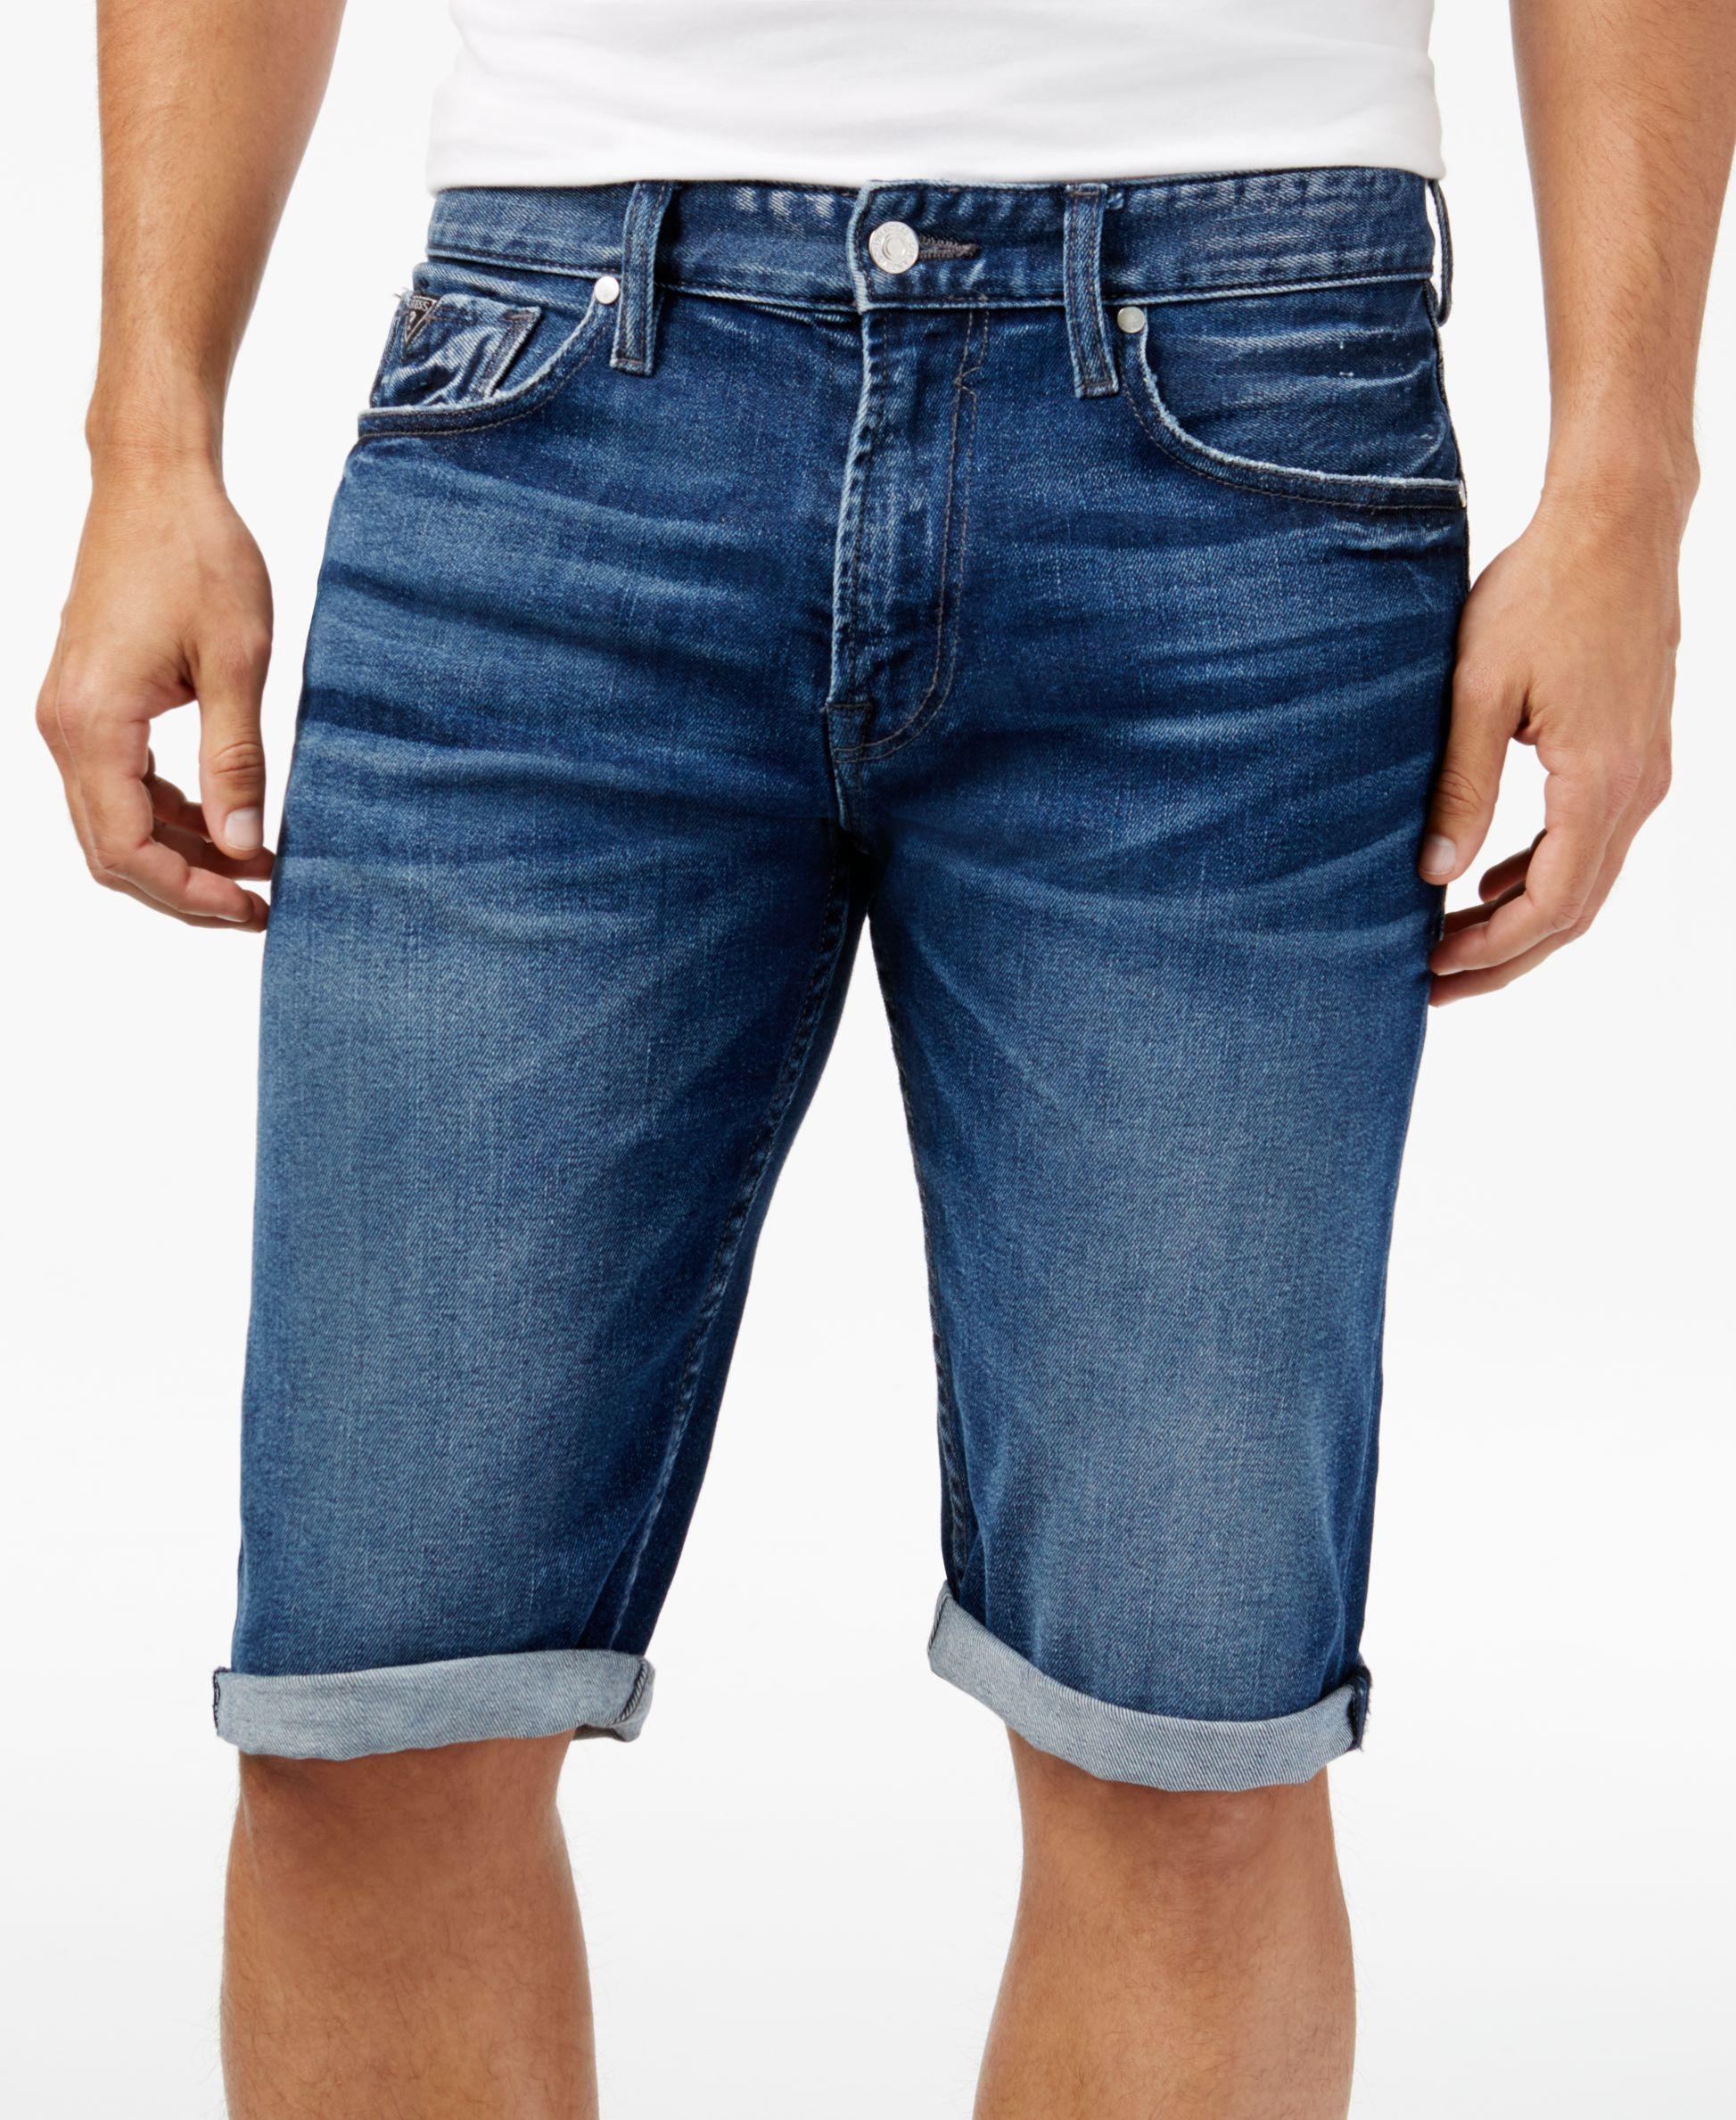 Guess Men's Regular-Fit Denim Shorts | Mens shorts, Guess men, Shorts